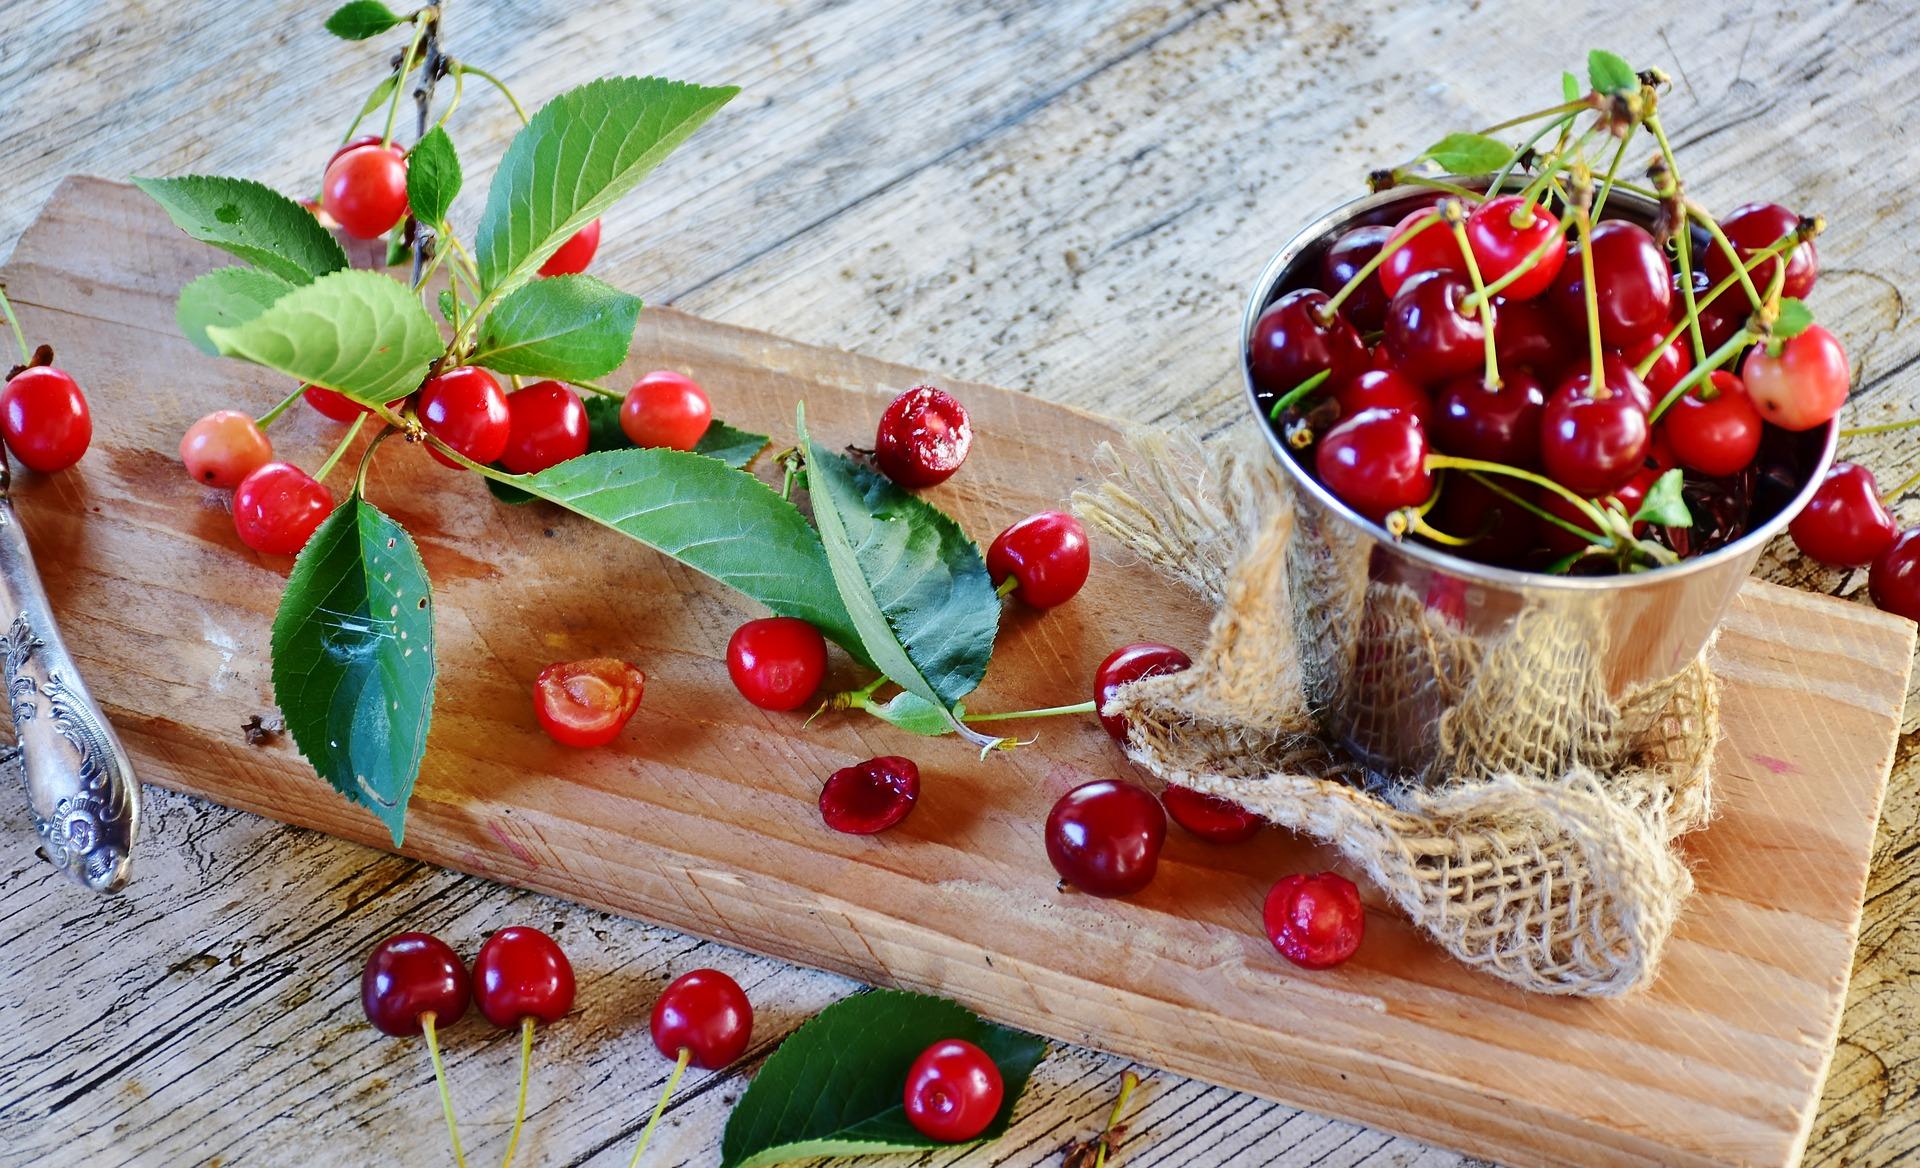 sour-cherries-3487221_1920